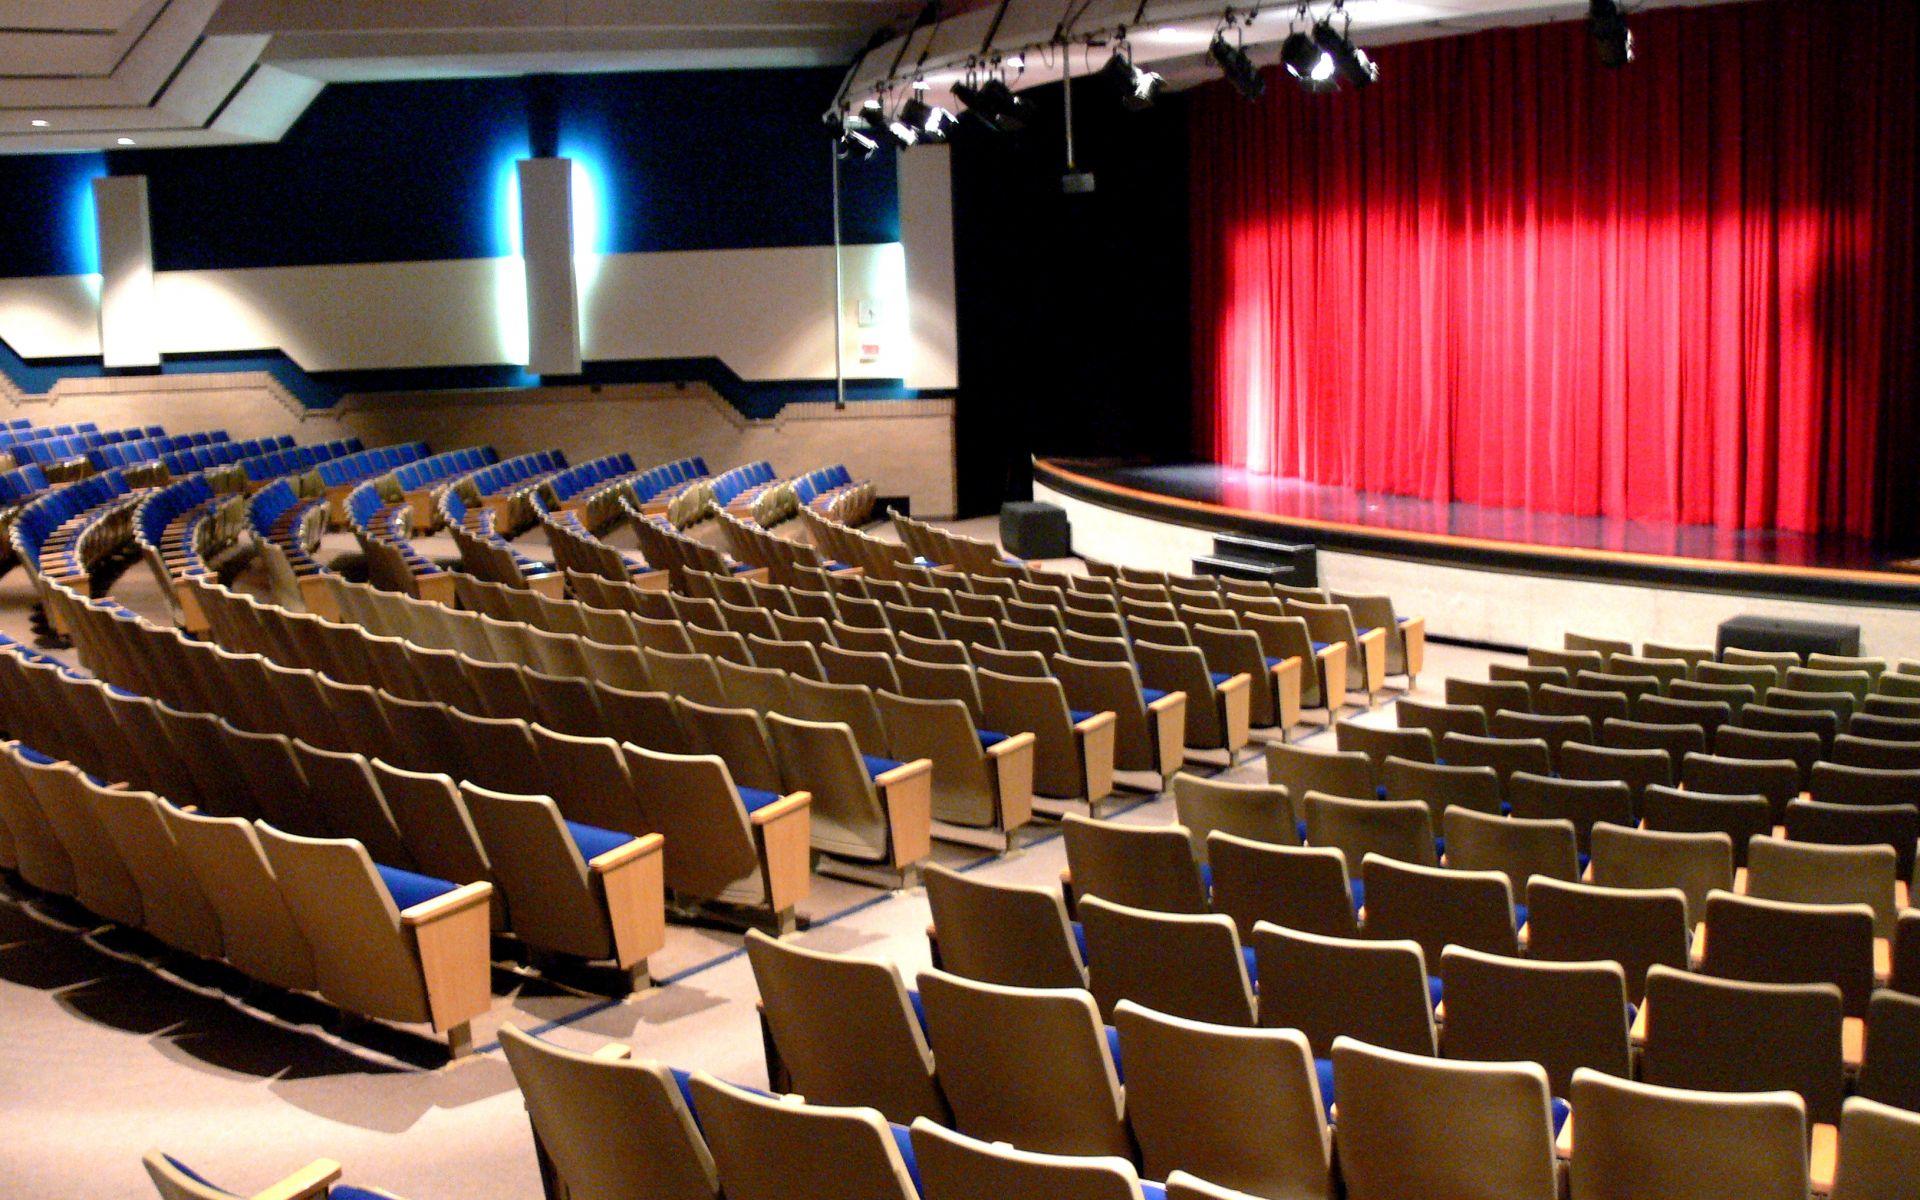 salle spectacle jesus